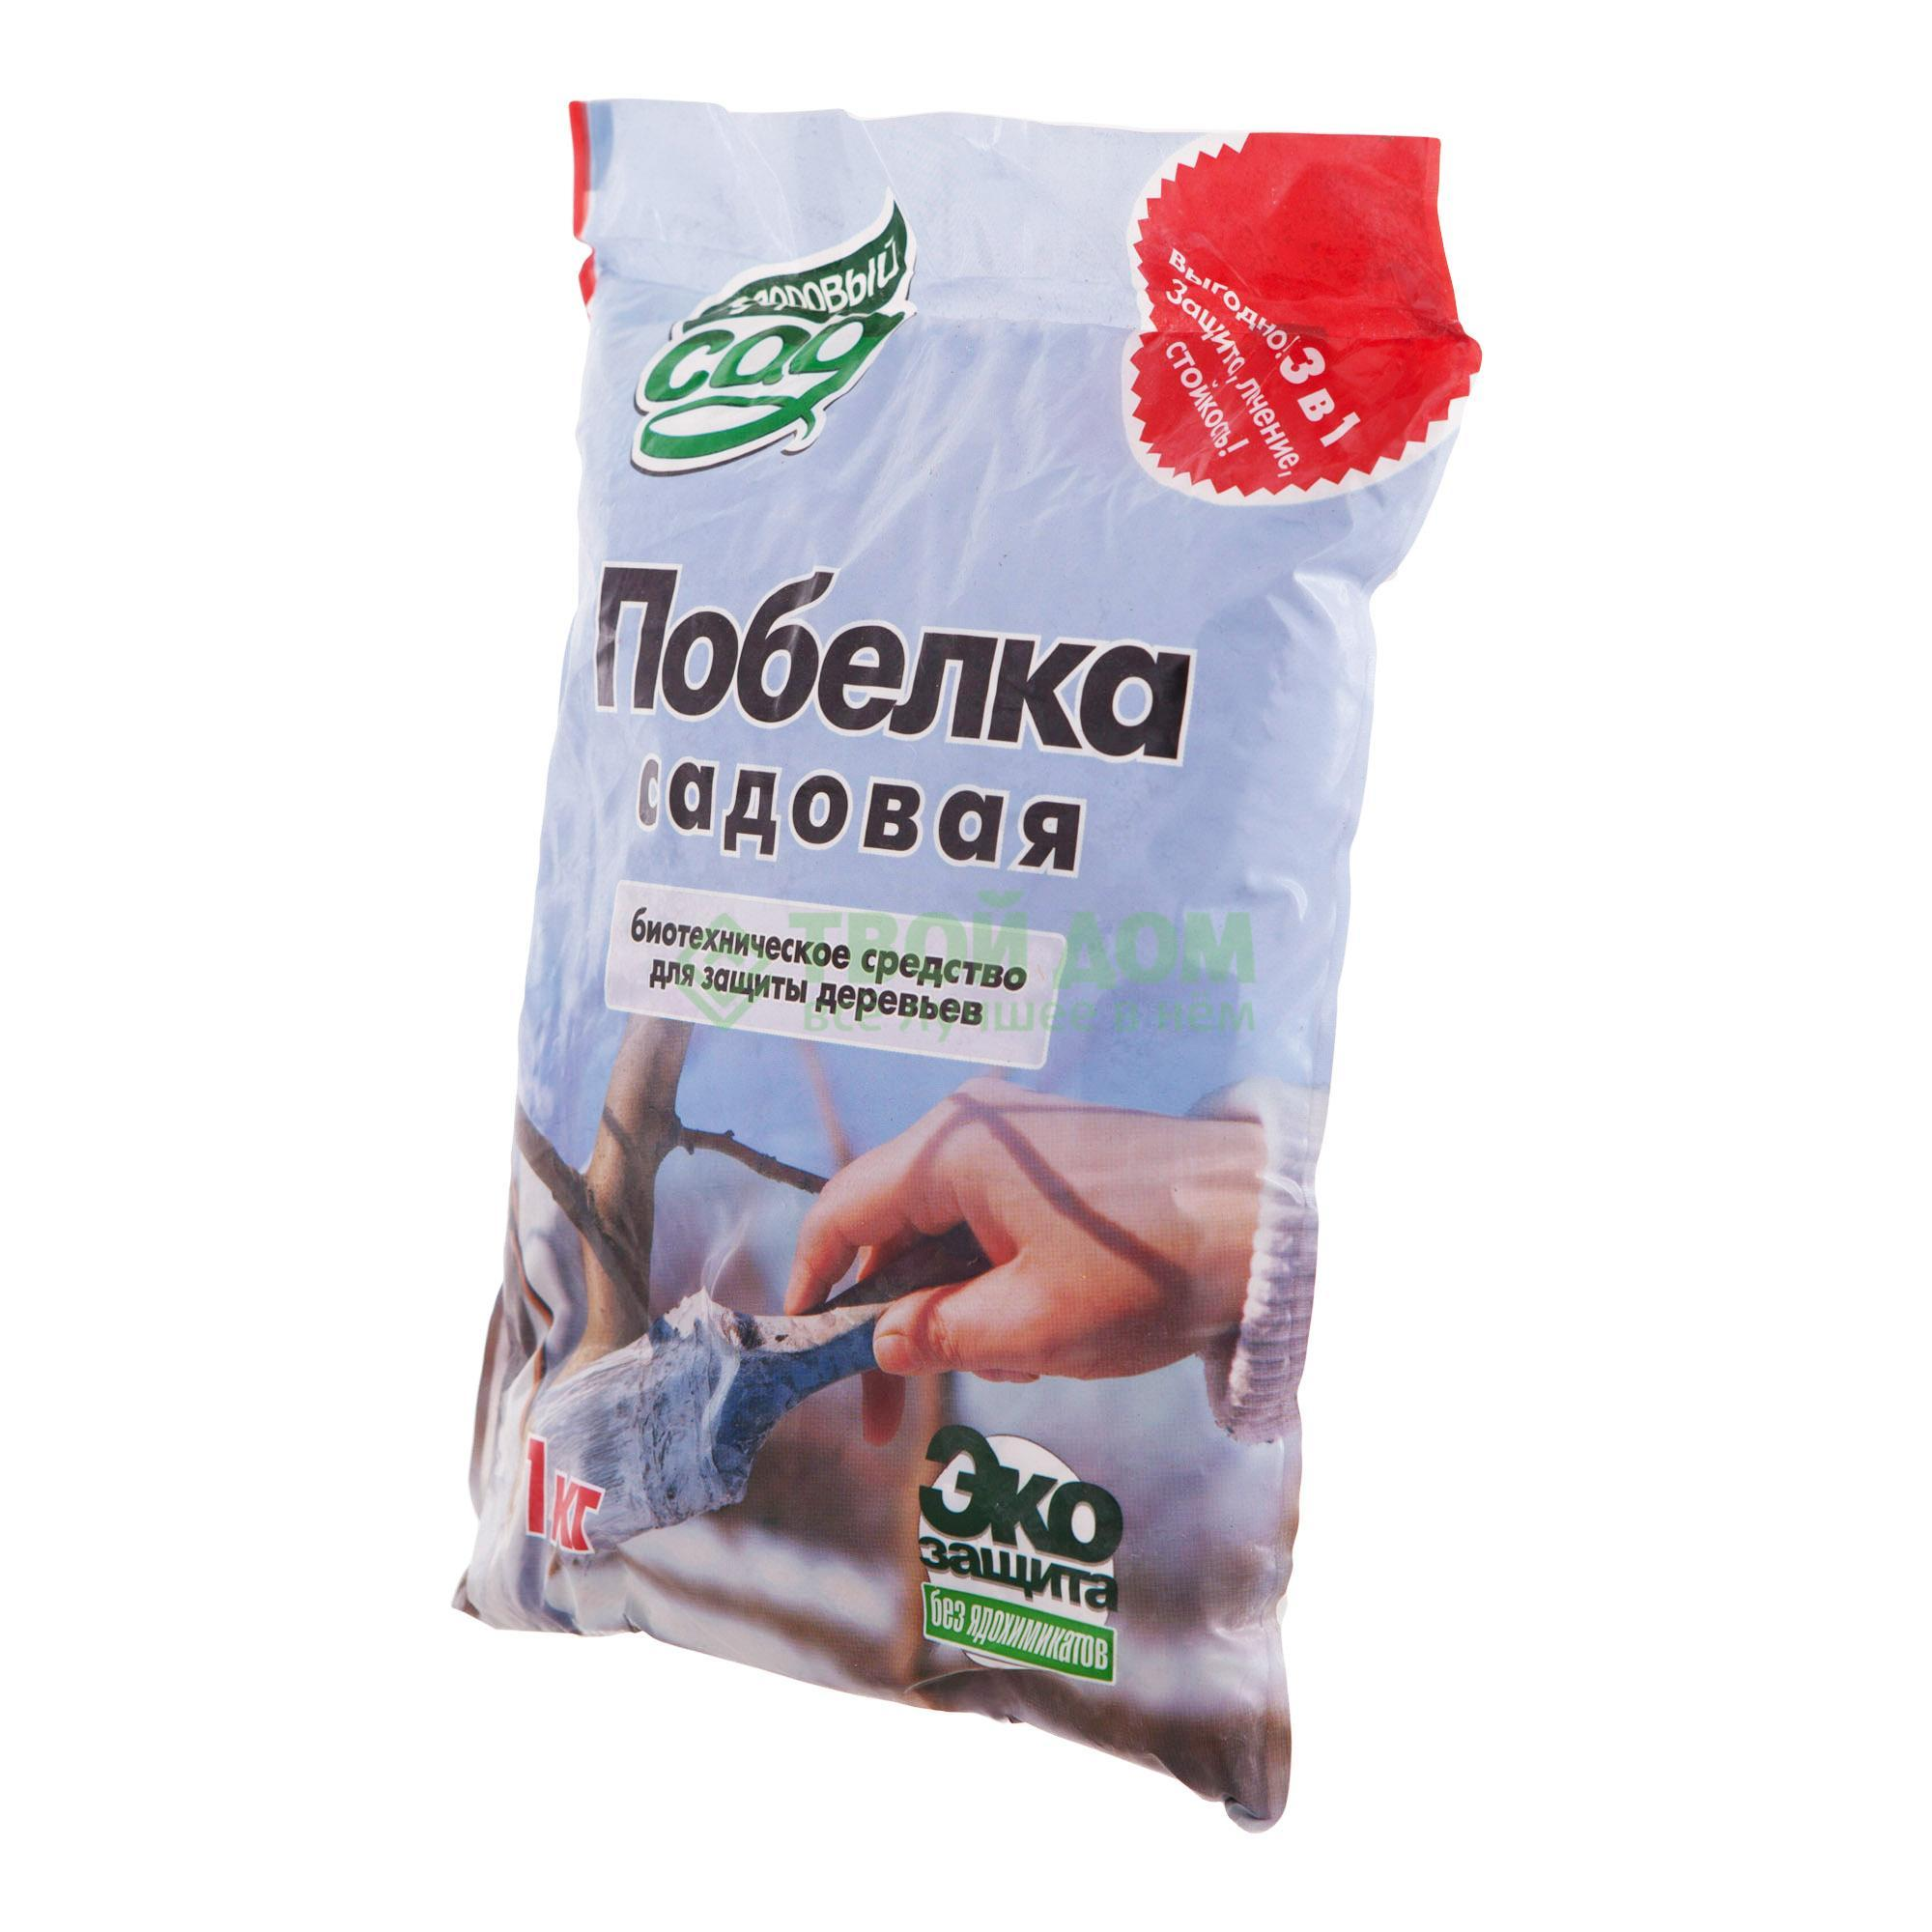 Краска-побелка Кострома садовая 1 кг фото